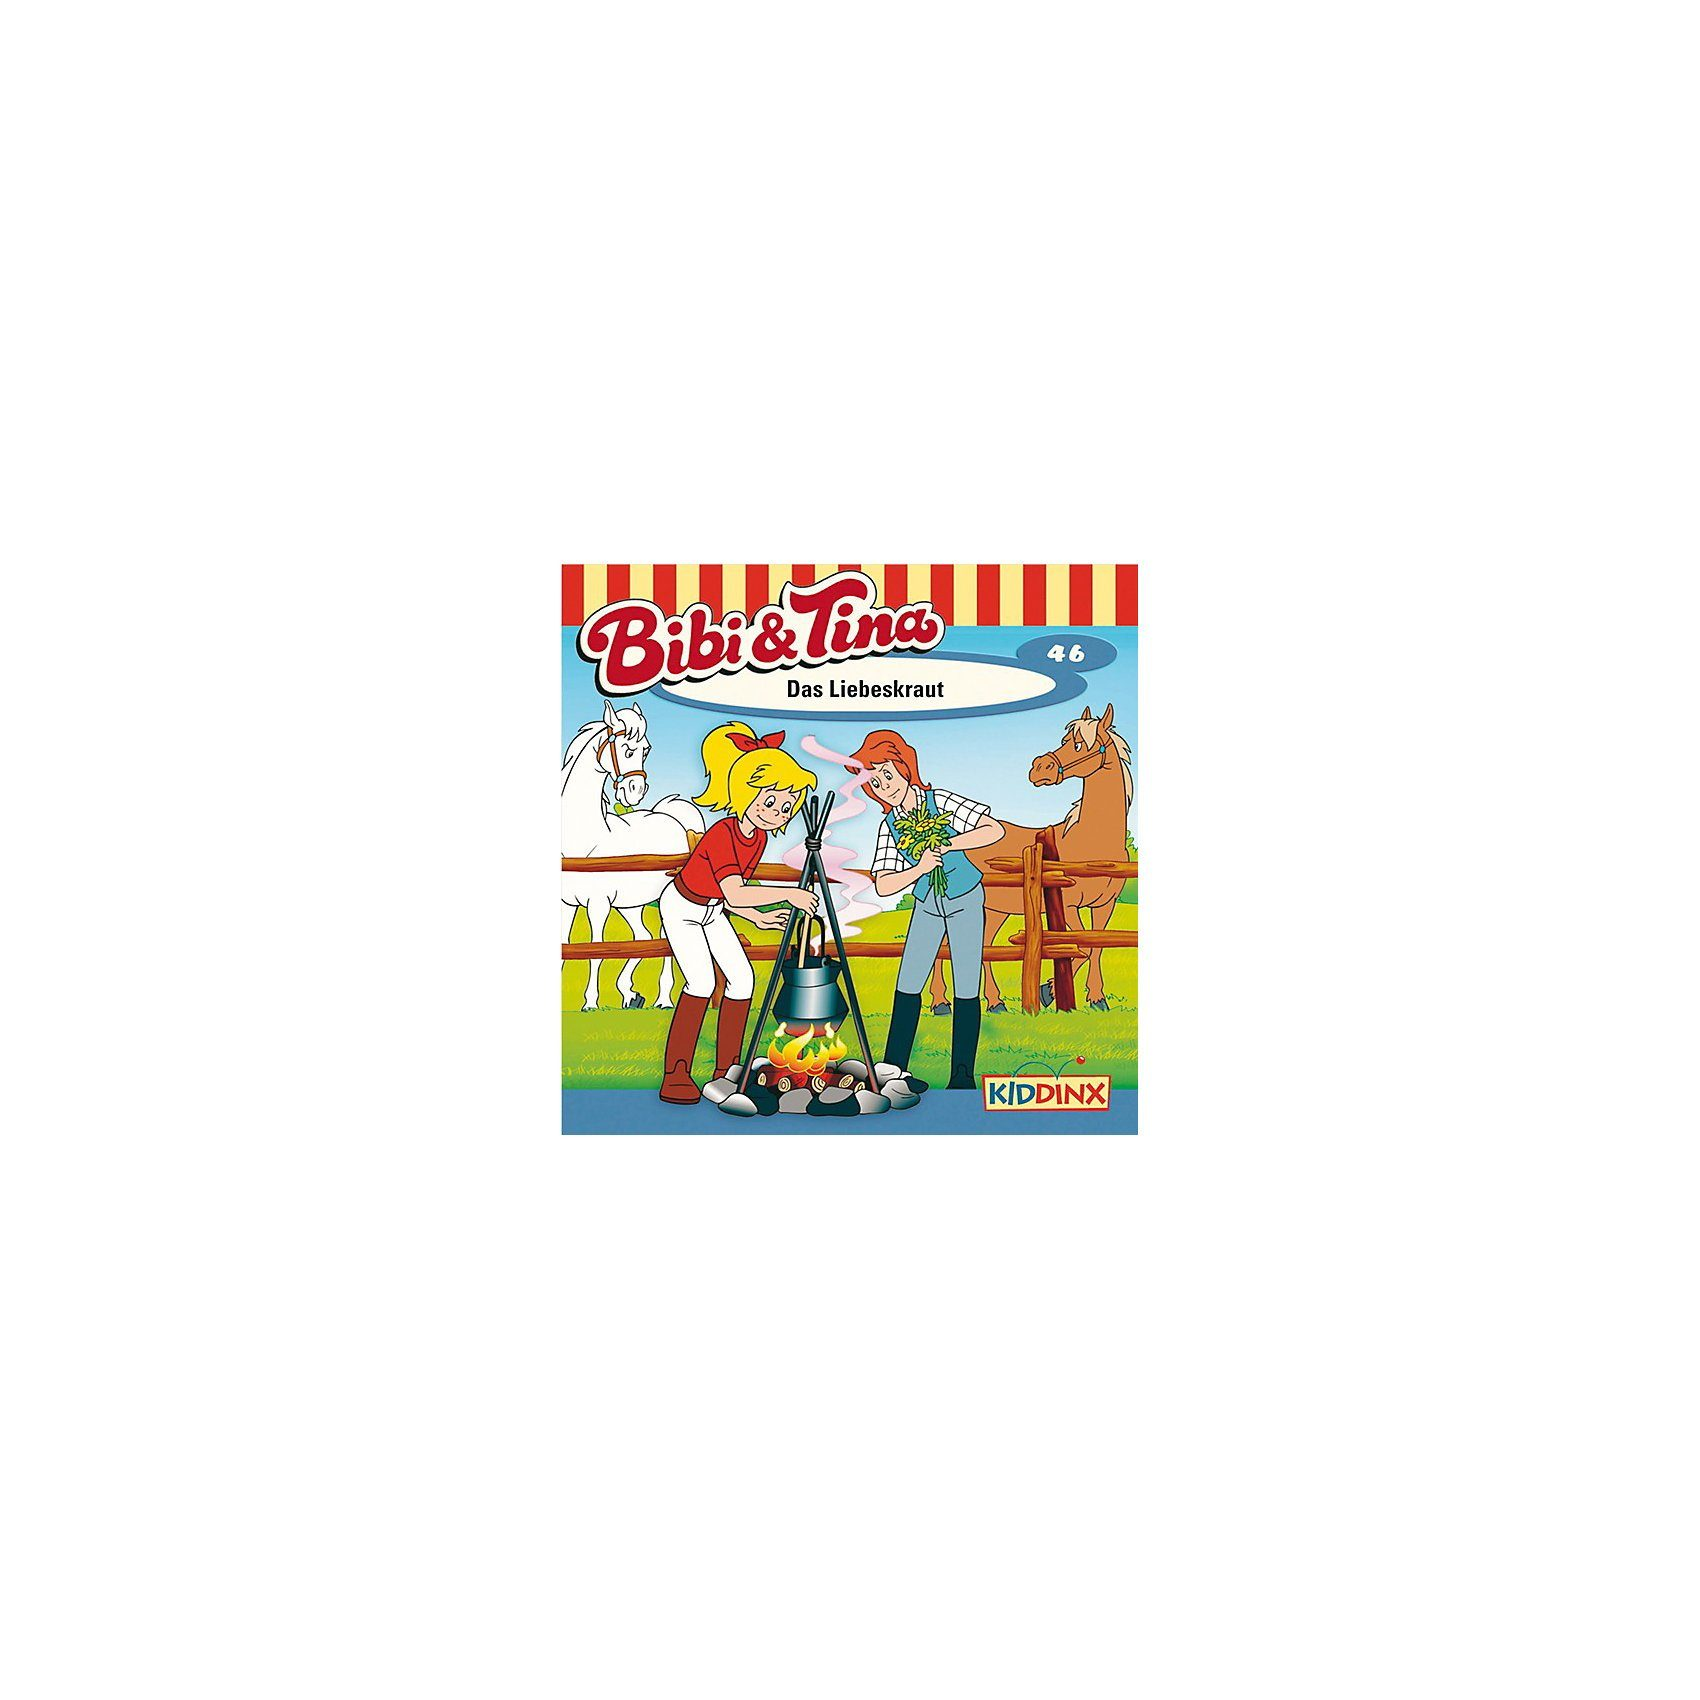 Kiddinx CD Bibi & Tina 46 - Das Liebeskraut